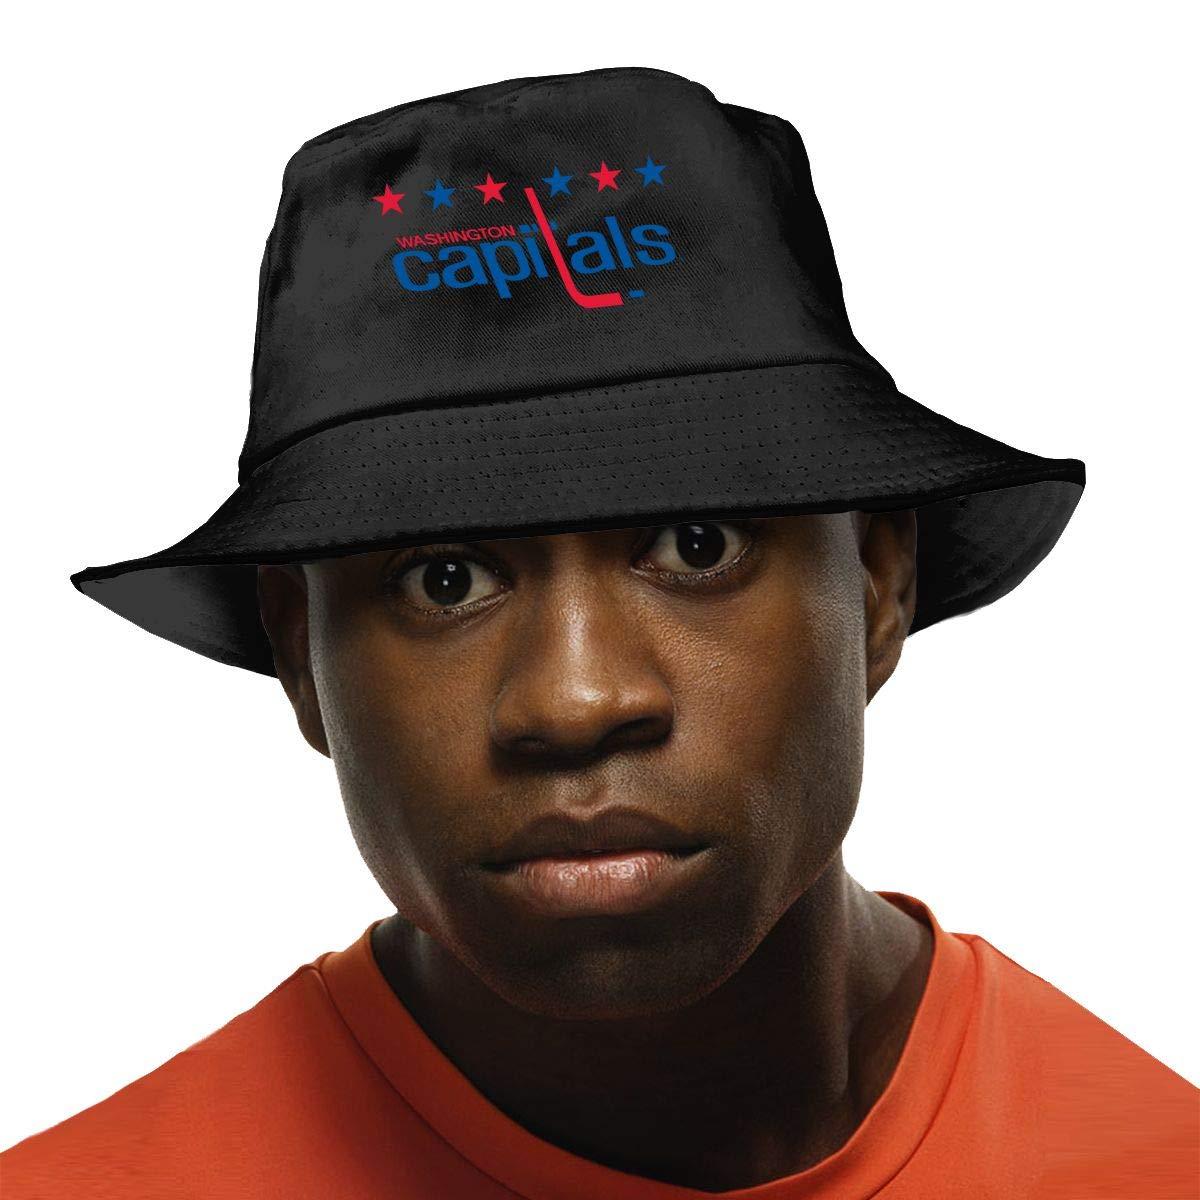 Capital Hockey Bucket Hat Summer Fisherman Cap Foldable Sun Protection Hat  at Amazon Men s Clothing store  2f7b55a1d50